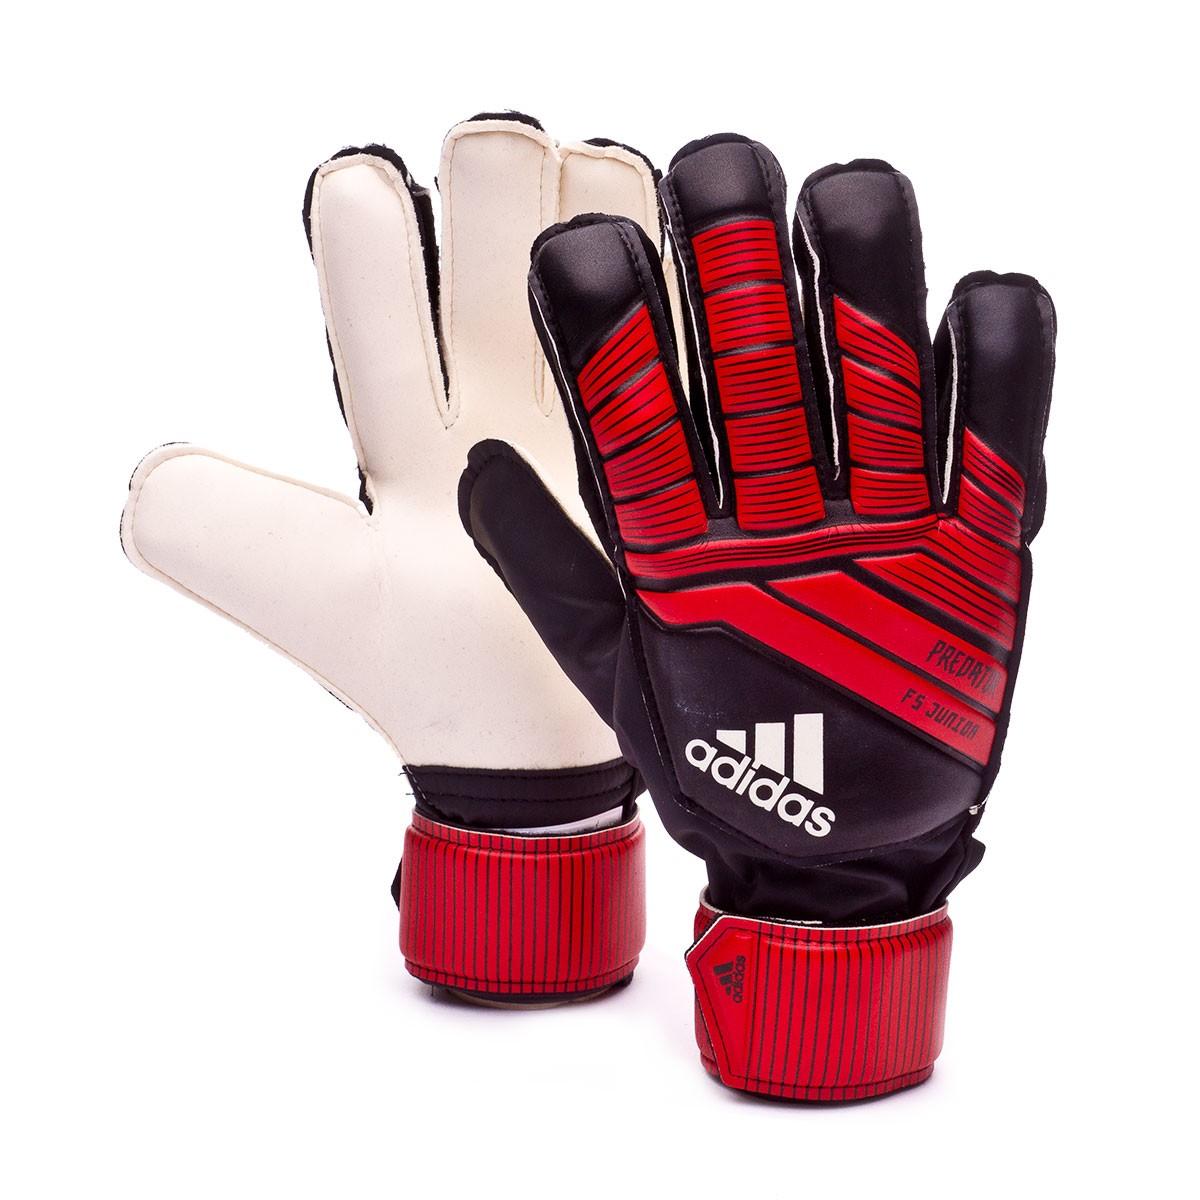 5500f57f97961 Luvas adidas Predator Fingersave Niño Black-Red-White - Loja de futebol  Fútbol Emotion